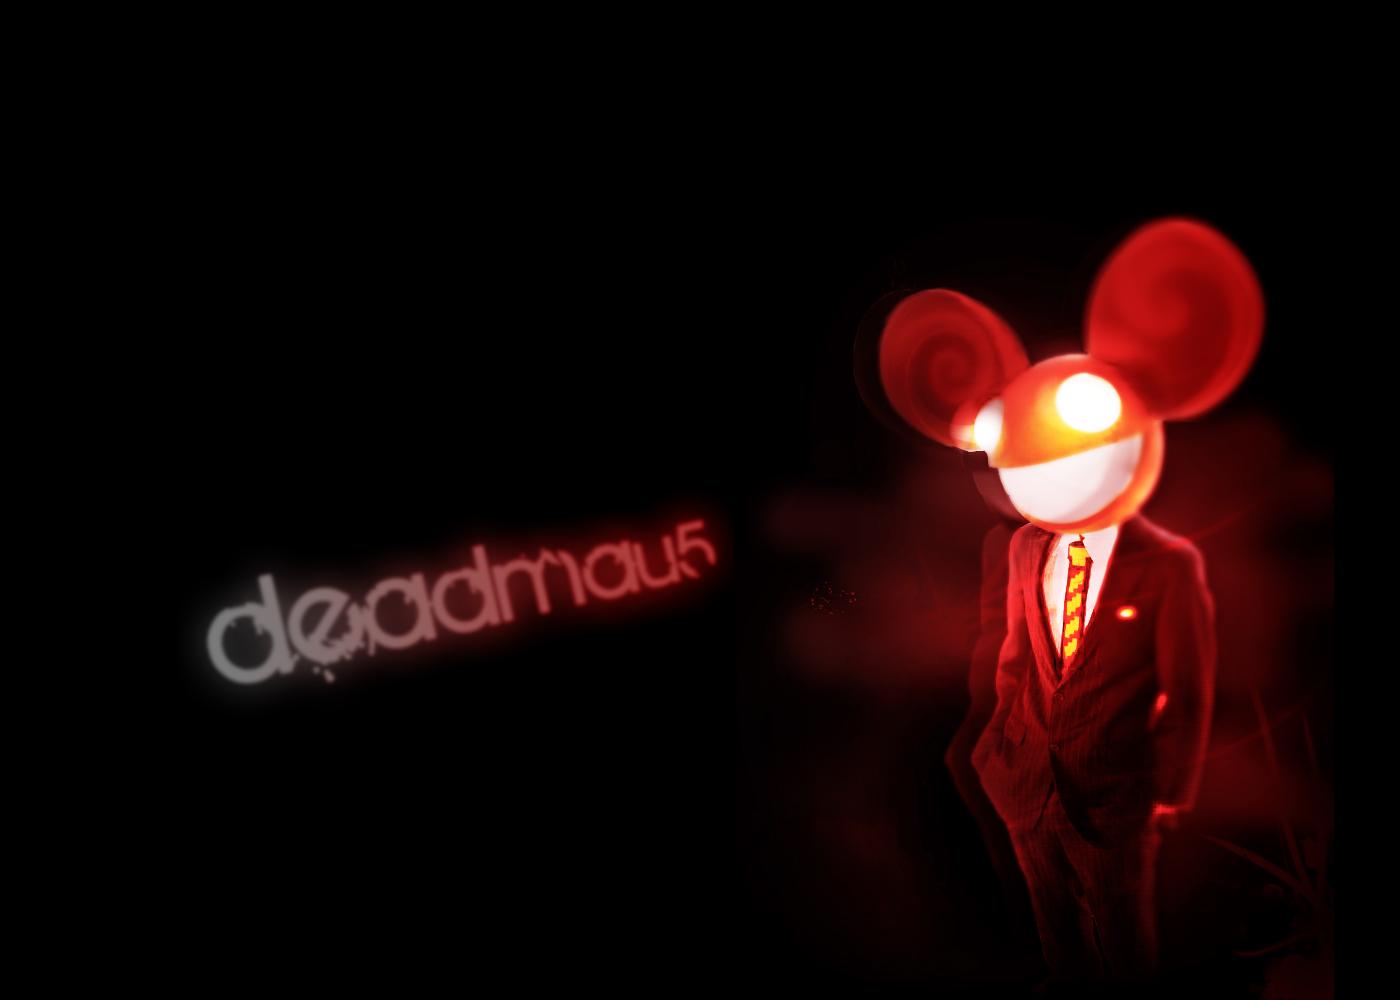 deadmau5 wallpaper by stig5 on deviantart